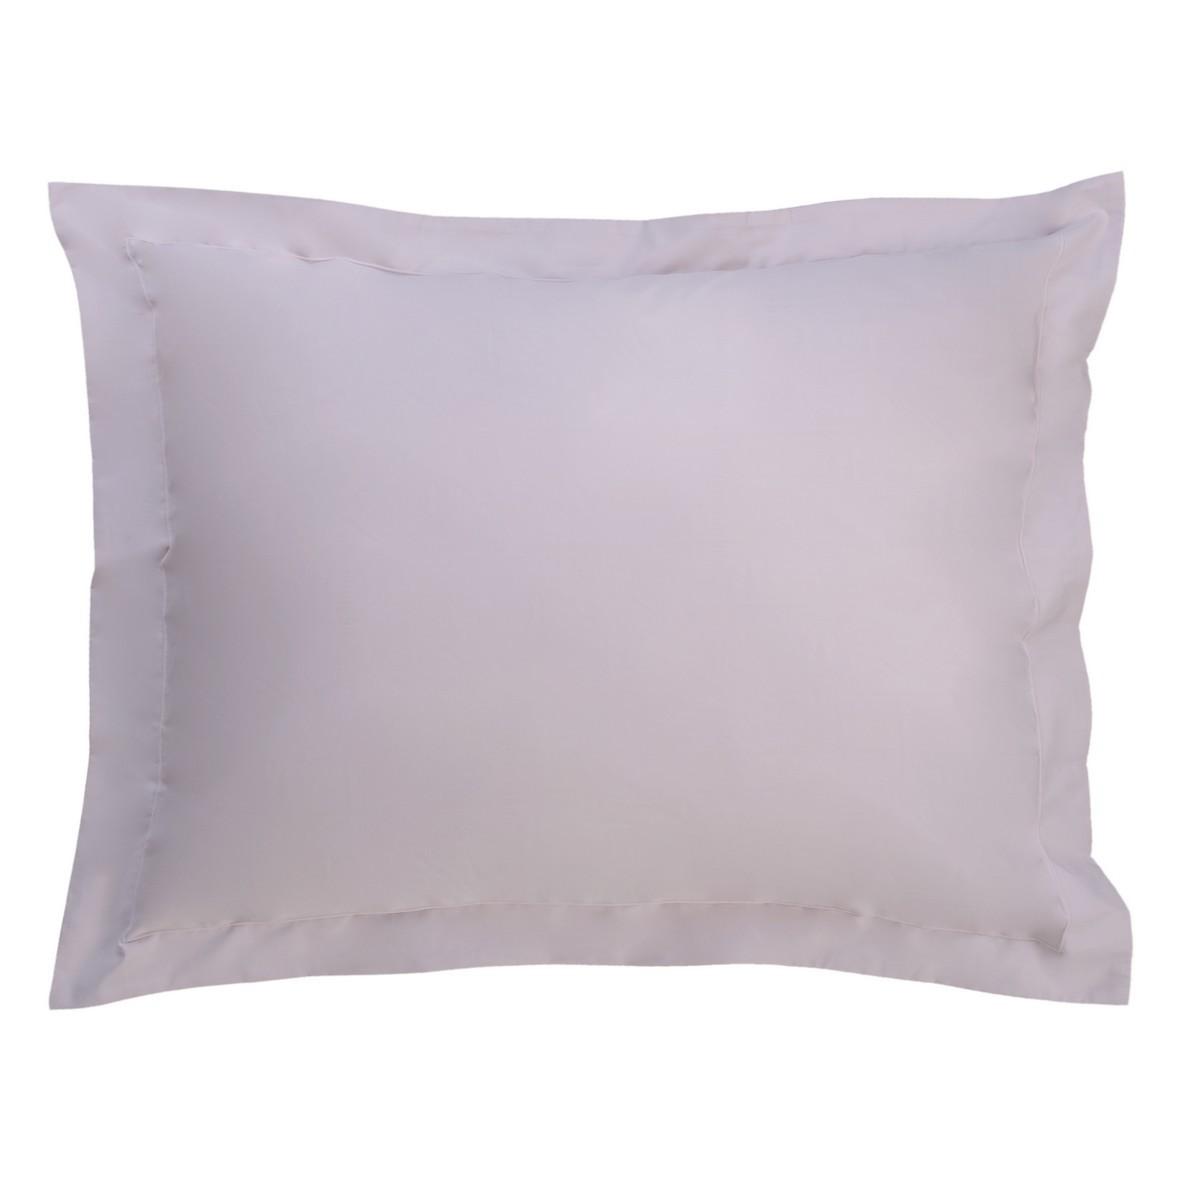 Pillowcase, Newlove